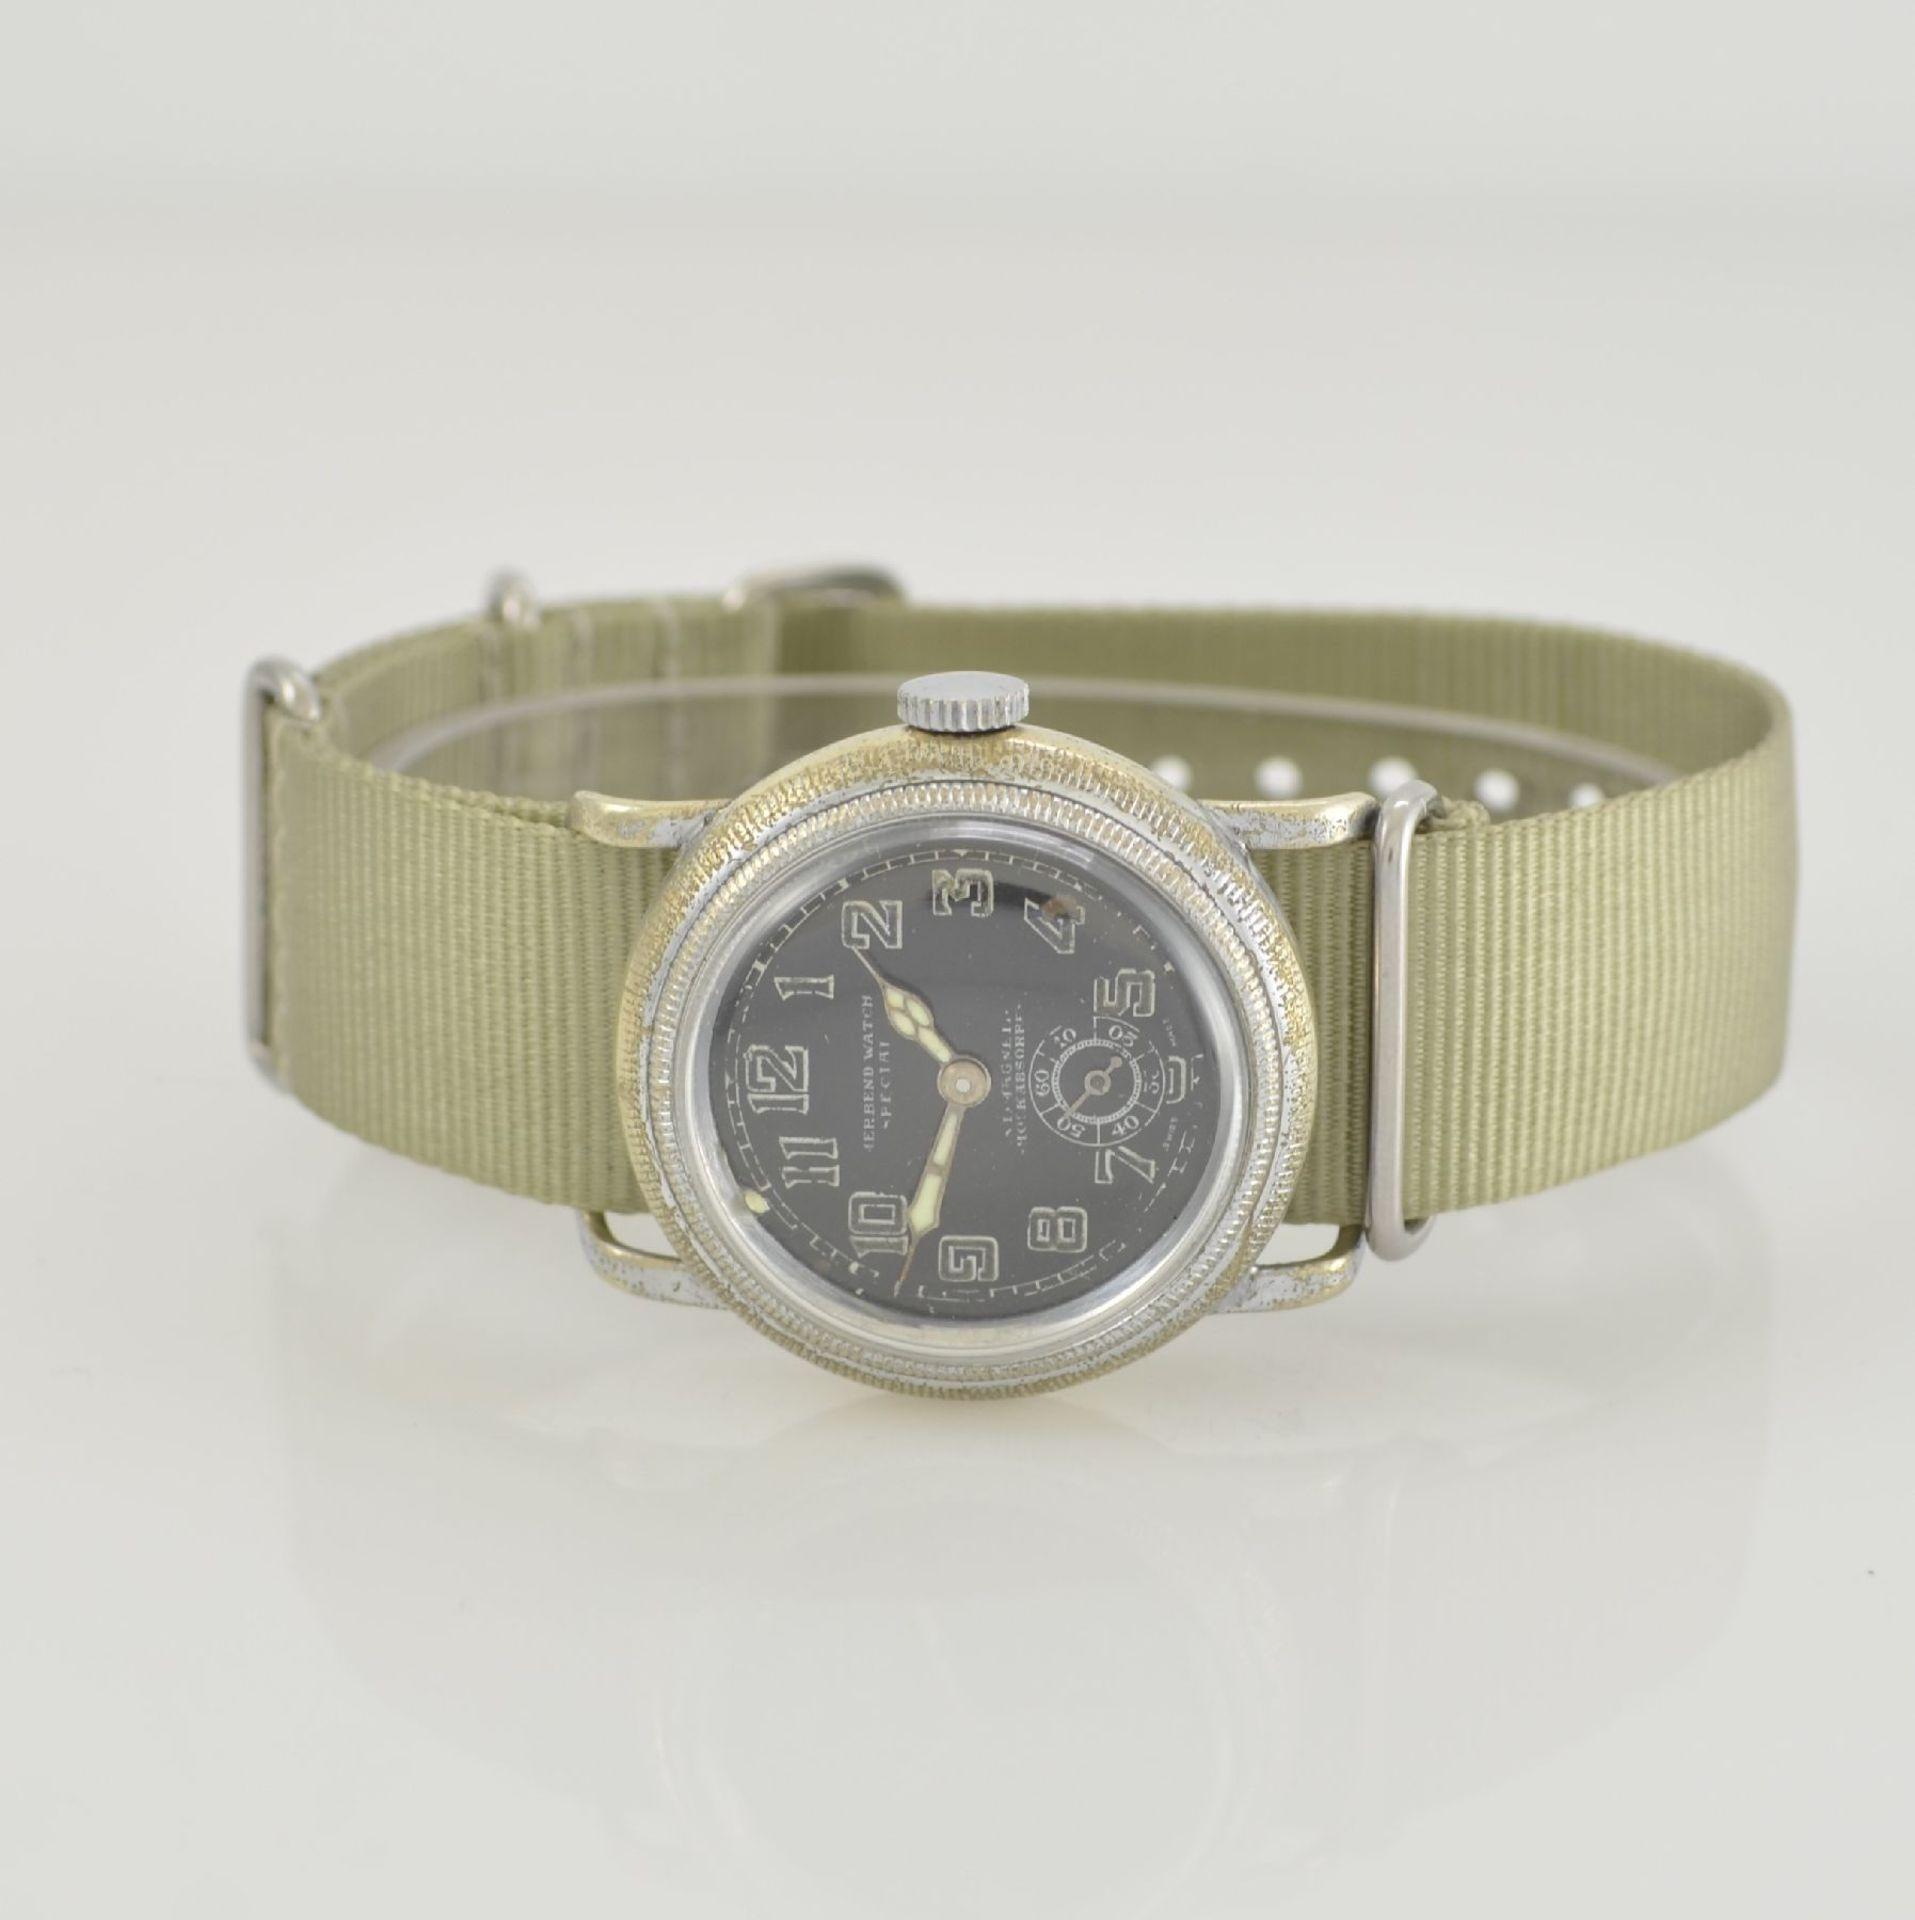 MERBEND WATCH Spezial Antimagnetic Schockabsorber Armbanduhr im Fliegerdesign, Schweiz um 1935,